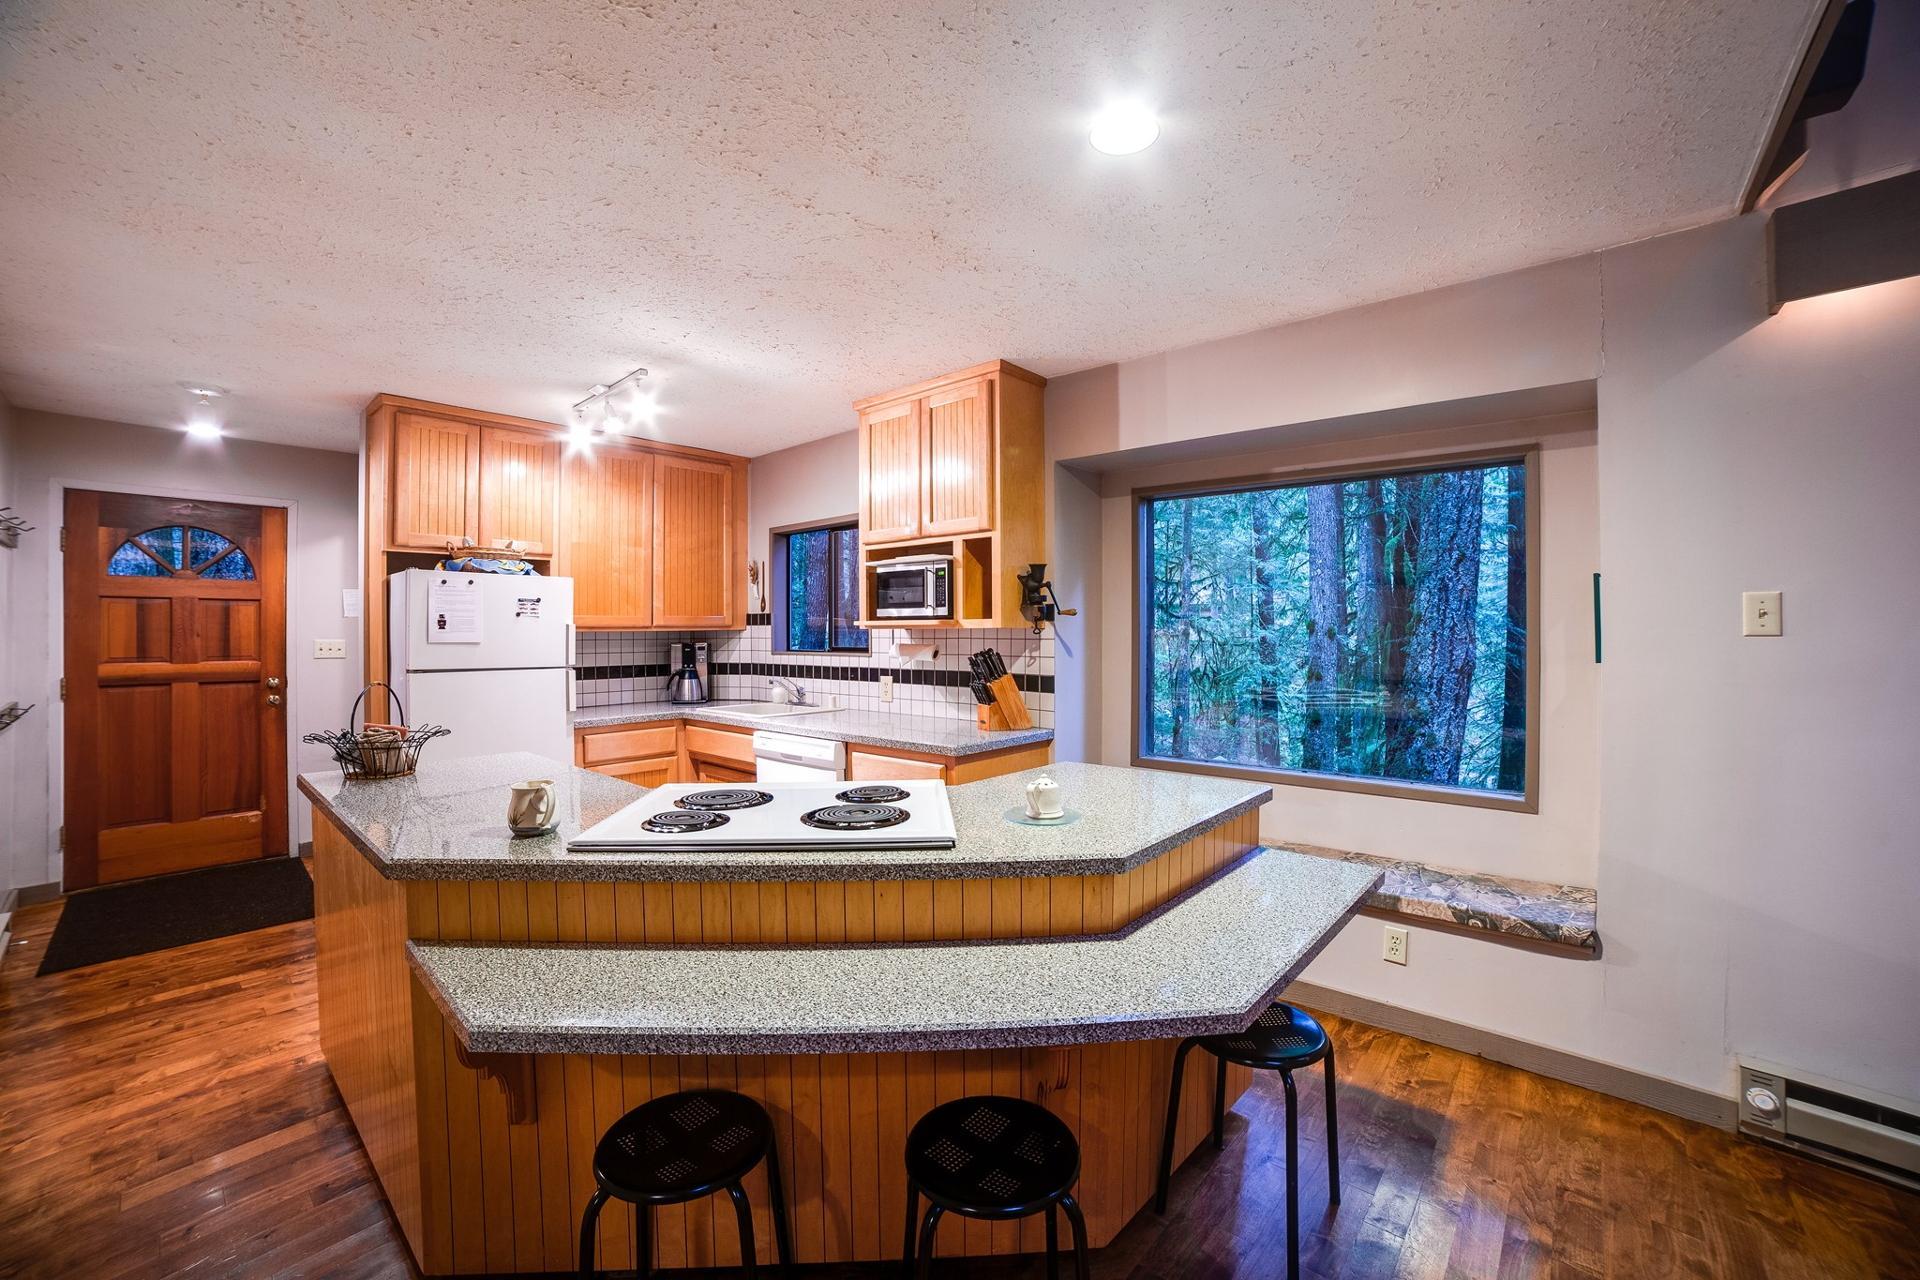 Apartment Mt  Baker Lodging Cabin  55 - HOT TUB  WOOD STOVE  BBQ  SLEEPS 10  photo 3999542